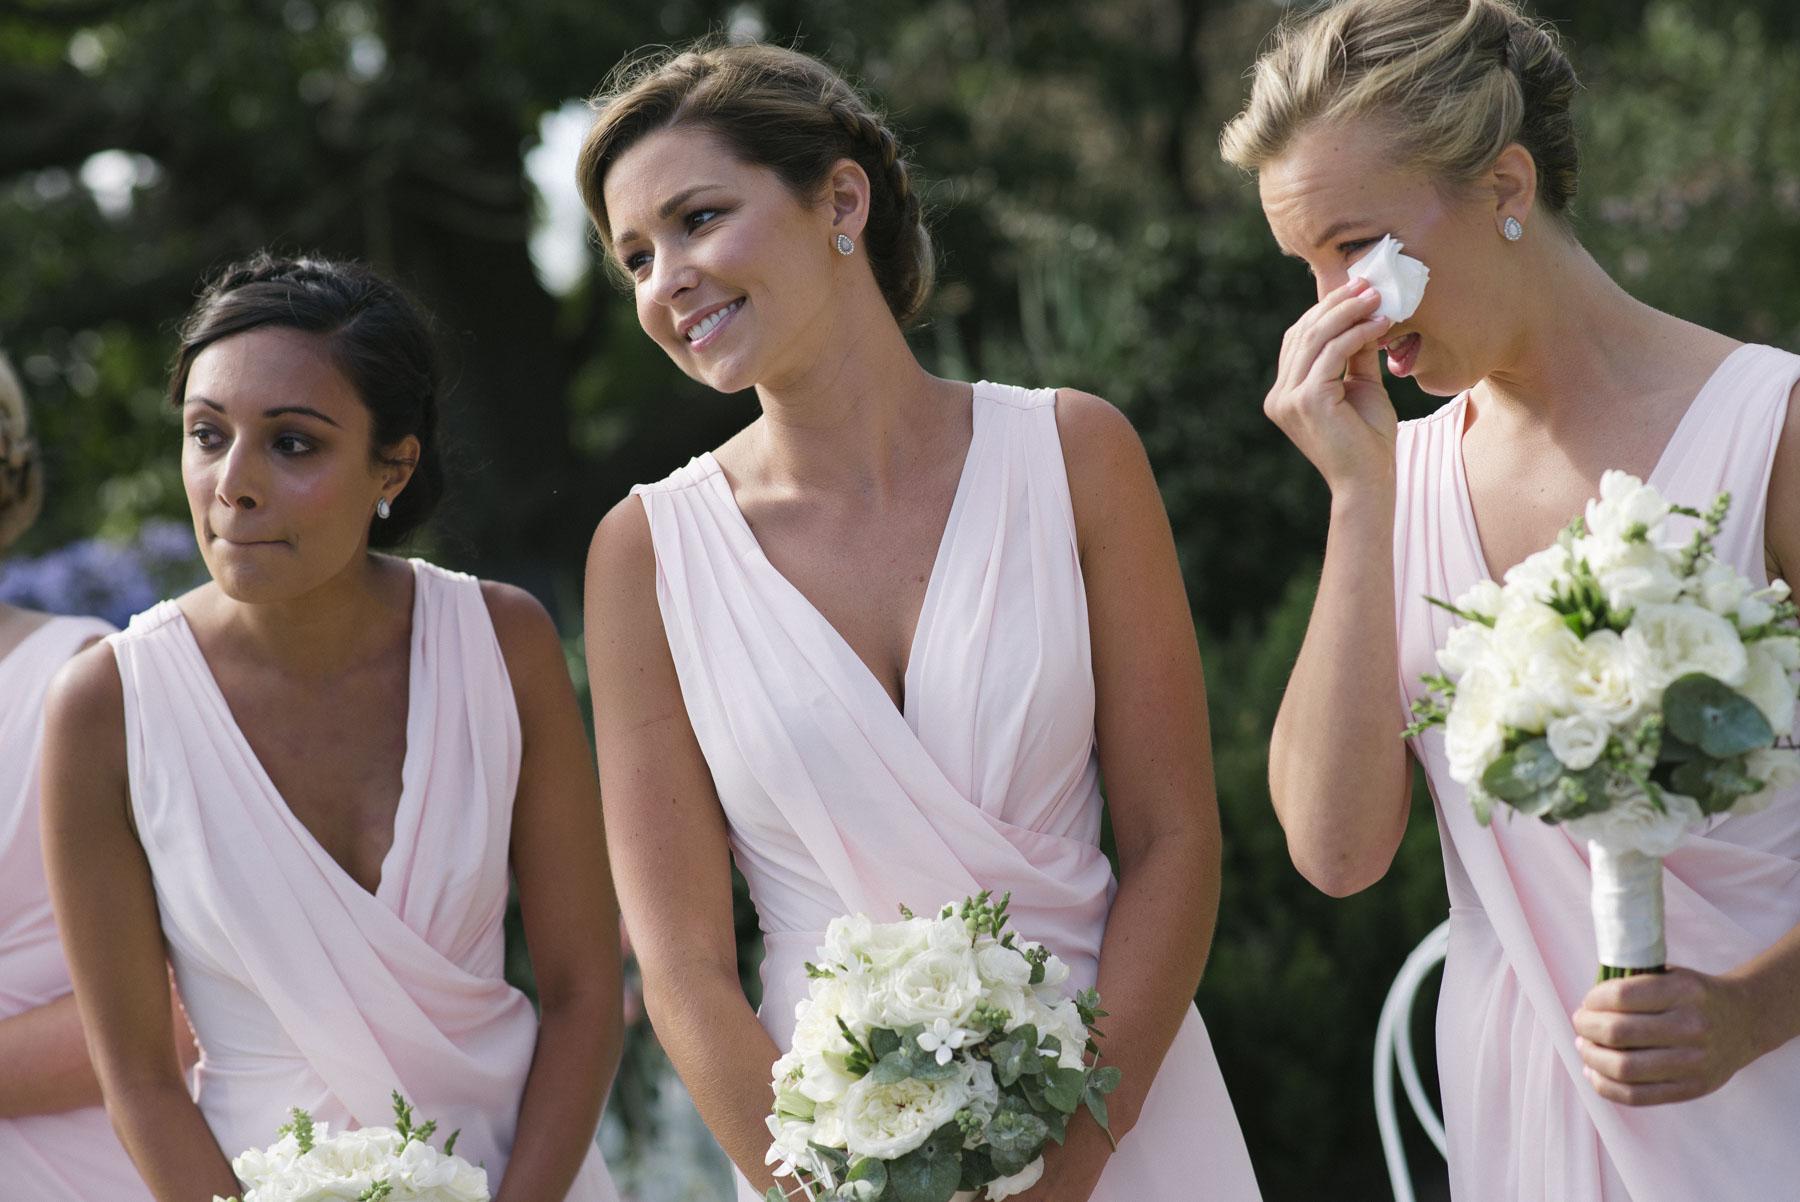 1501vand-155alan_moyle_wedding_portrait_brighton_bayside_werribee_estate_mansion_zoo_rustic_styled_garden_mansion_candid_documentry_victoria_whitelaw.jpg